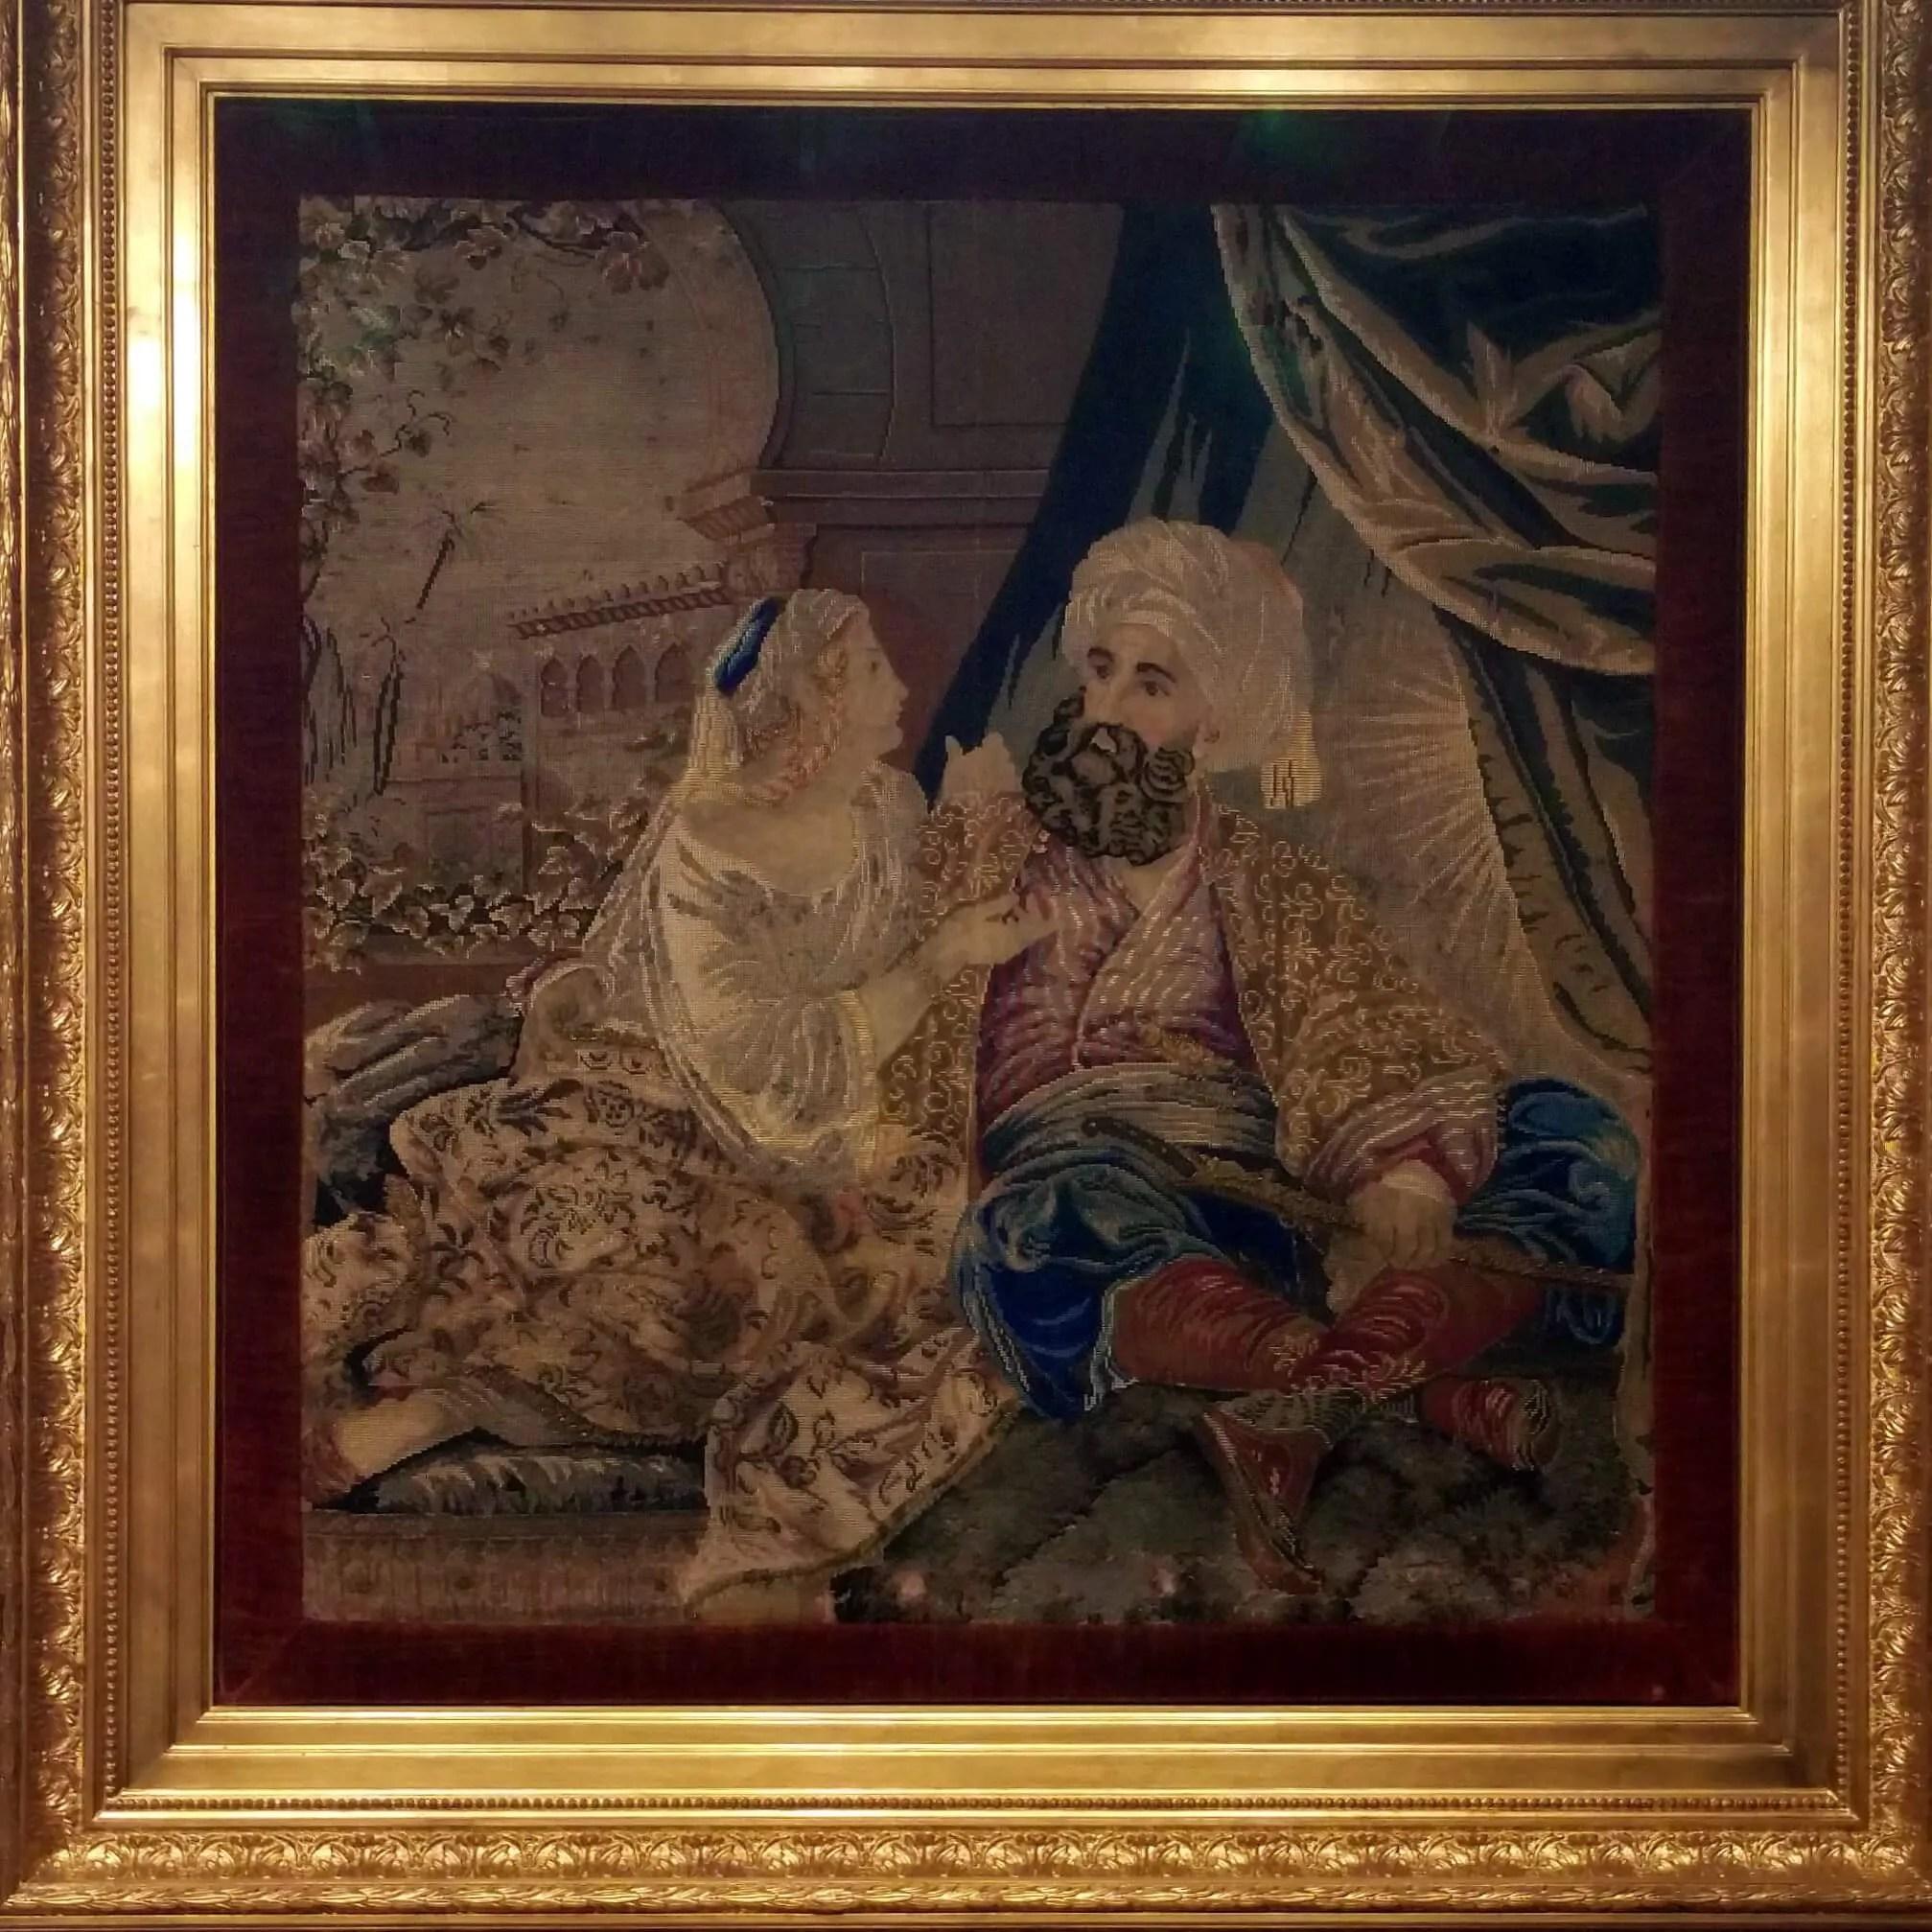 Ali Pasha & Kyra Vassiliki tapestry - Ali Pasha Museum, Ioannina, Greece | Kicking Back the Pebbles